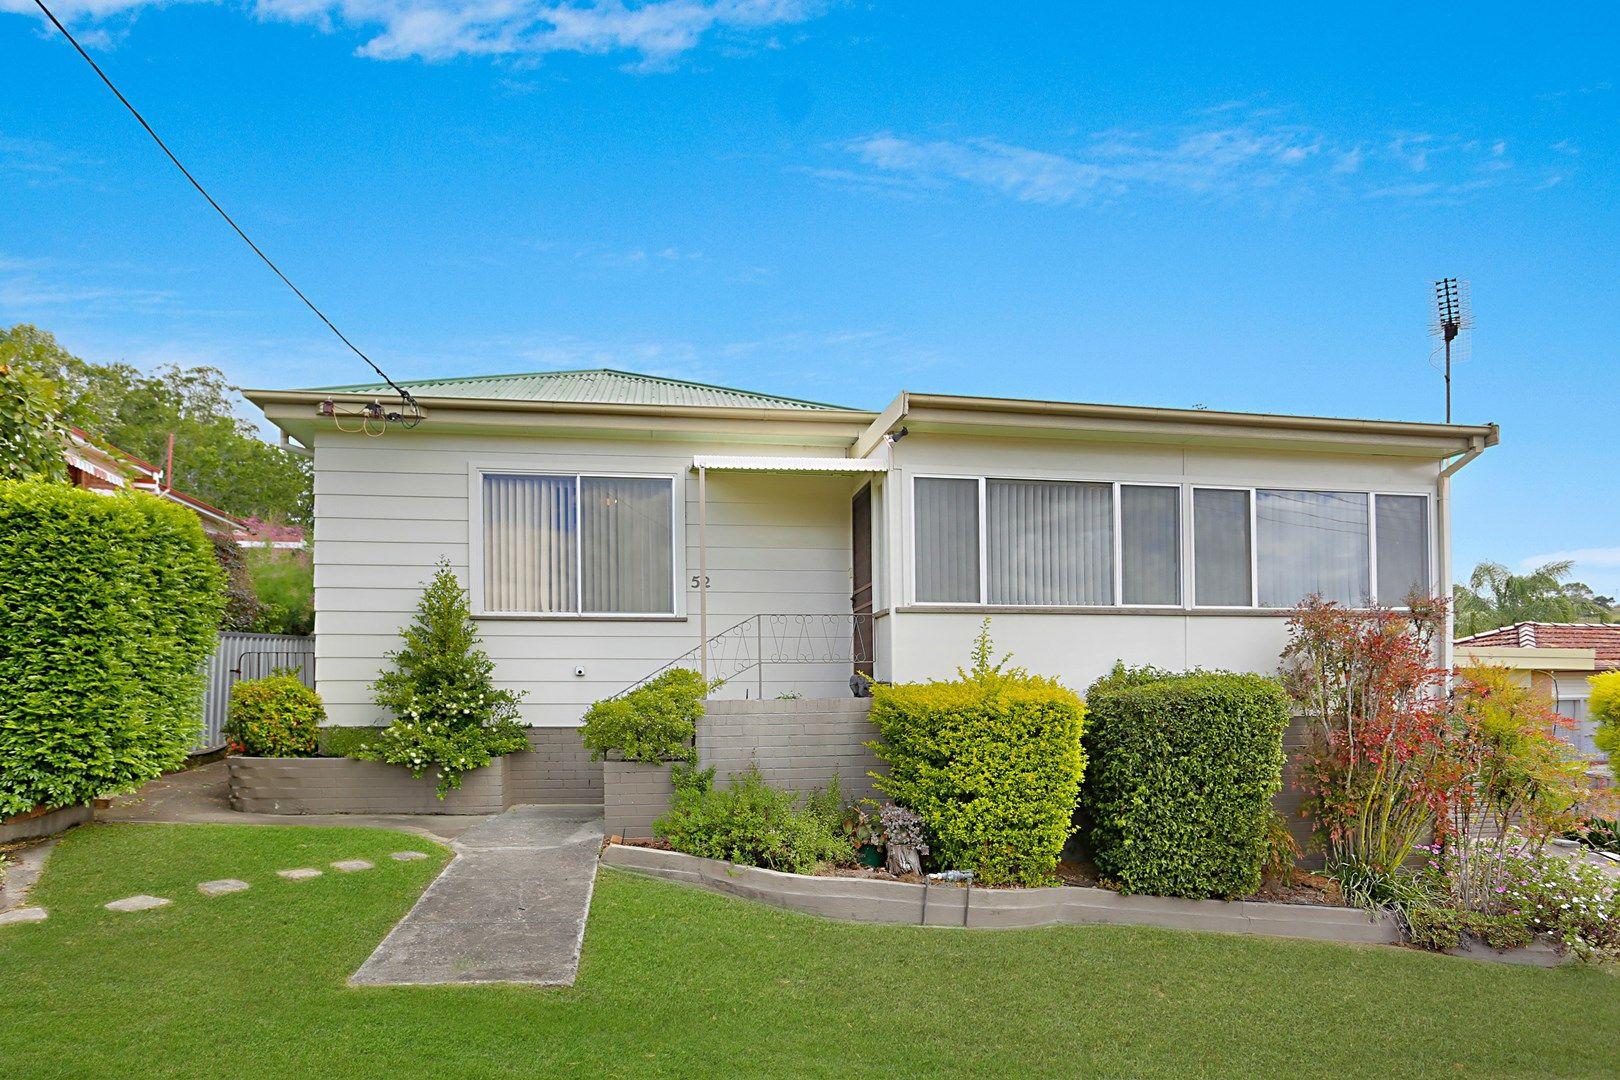 52 Myles Street, Dungog NSW 2420, Image 0